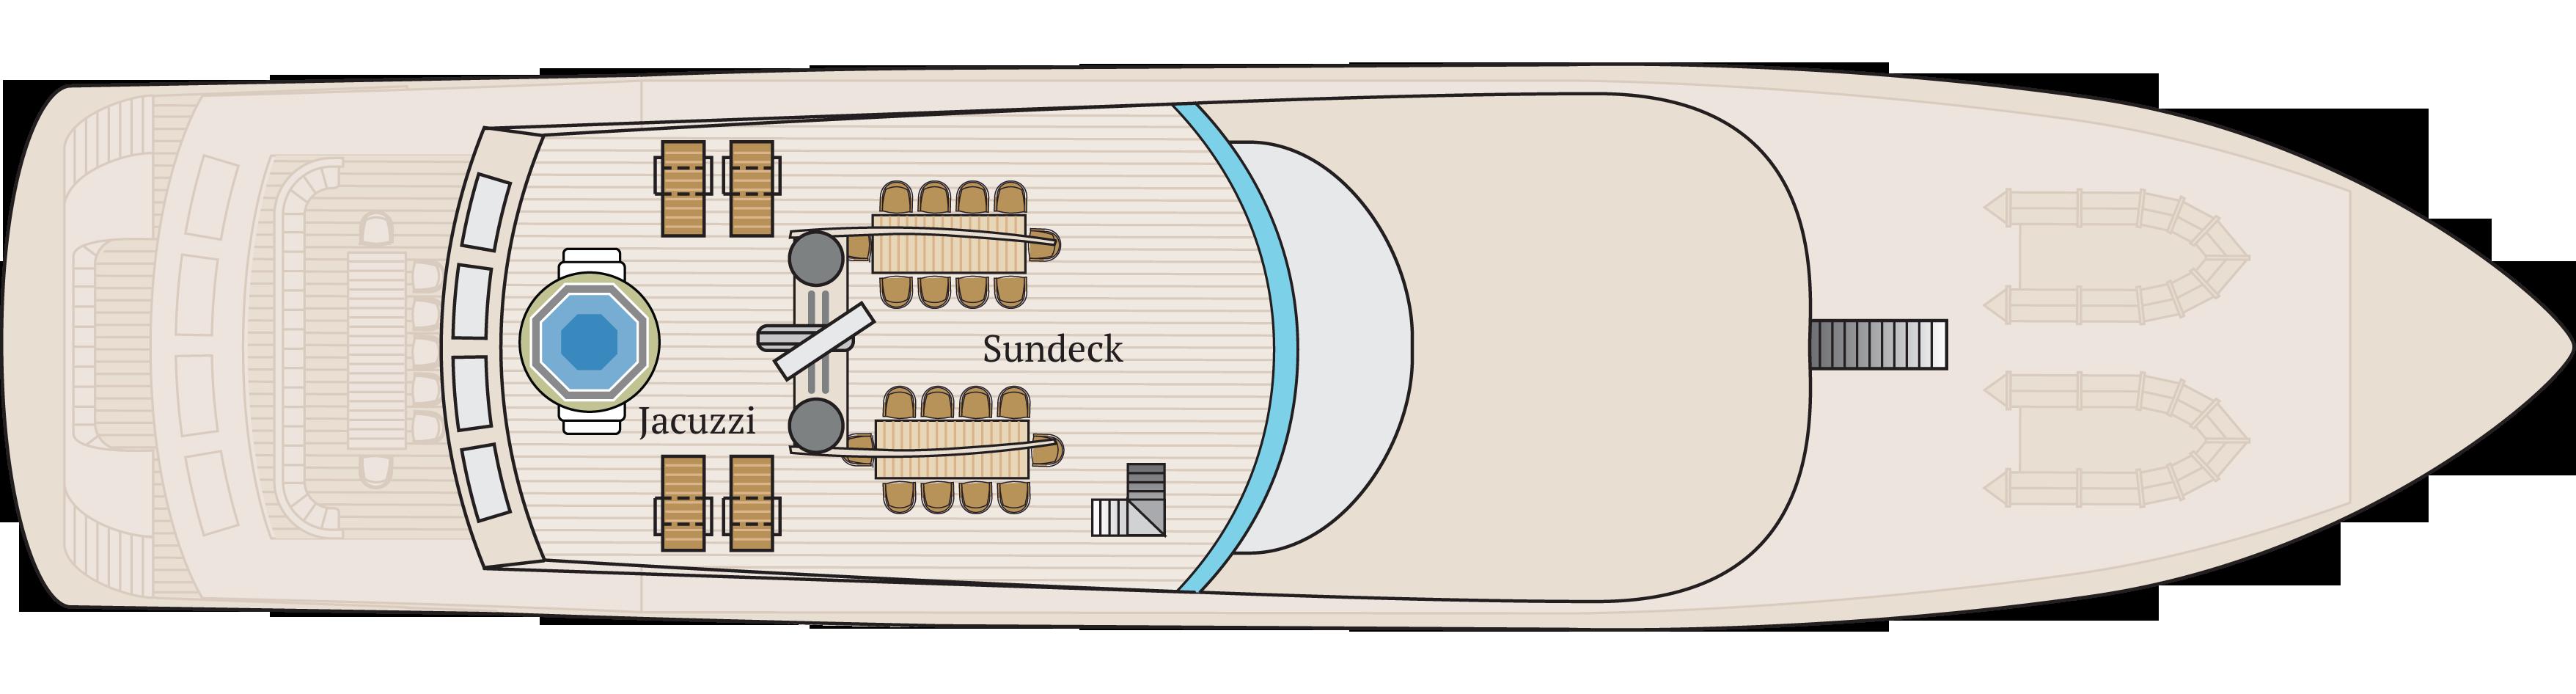 Sun deck | M/Y Infinity